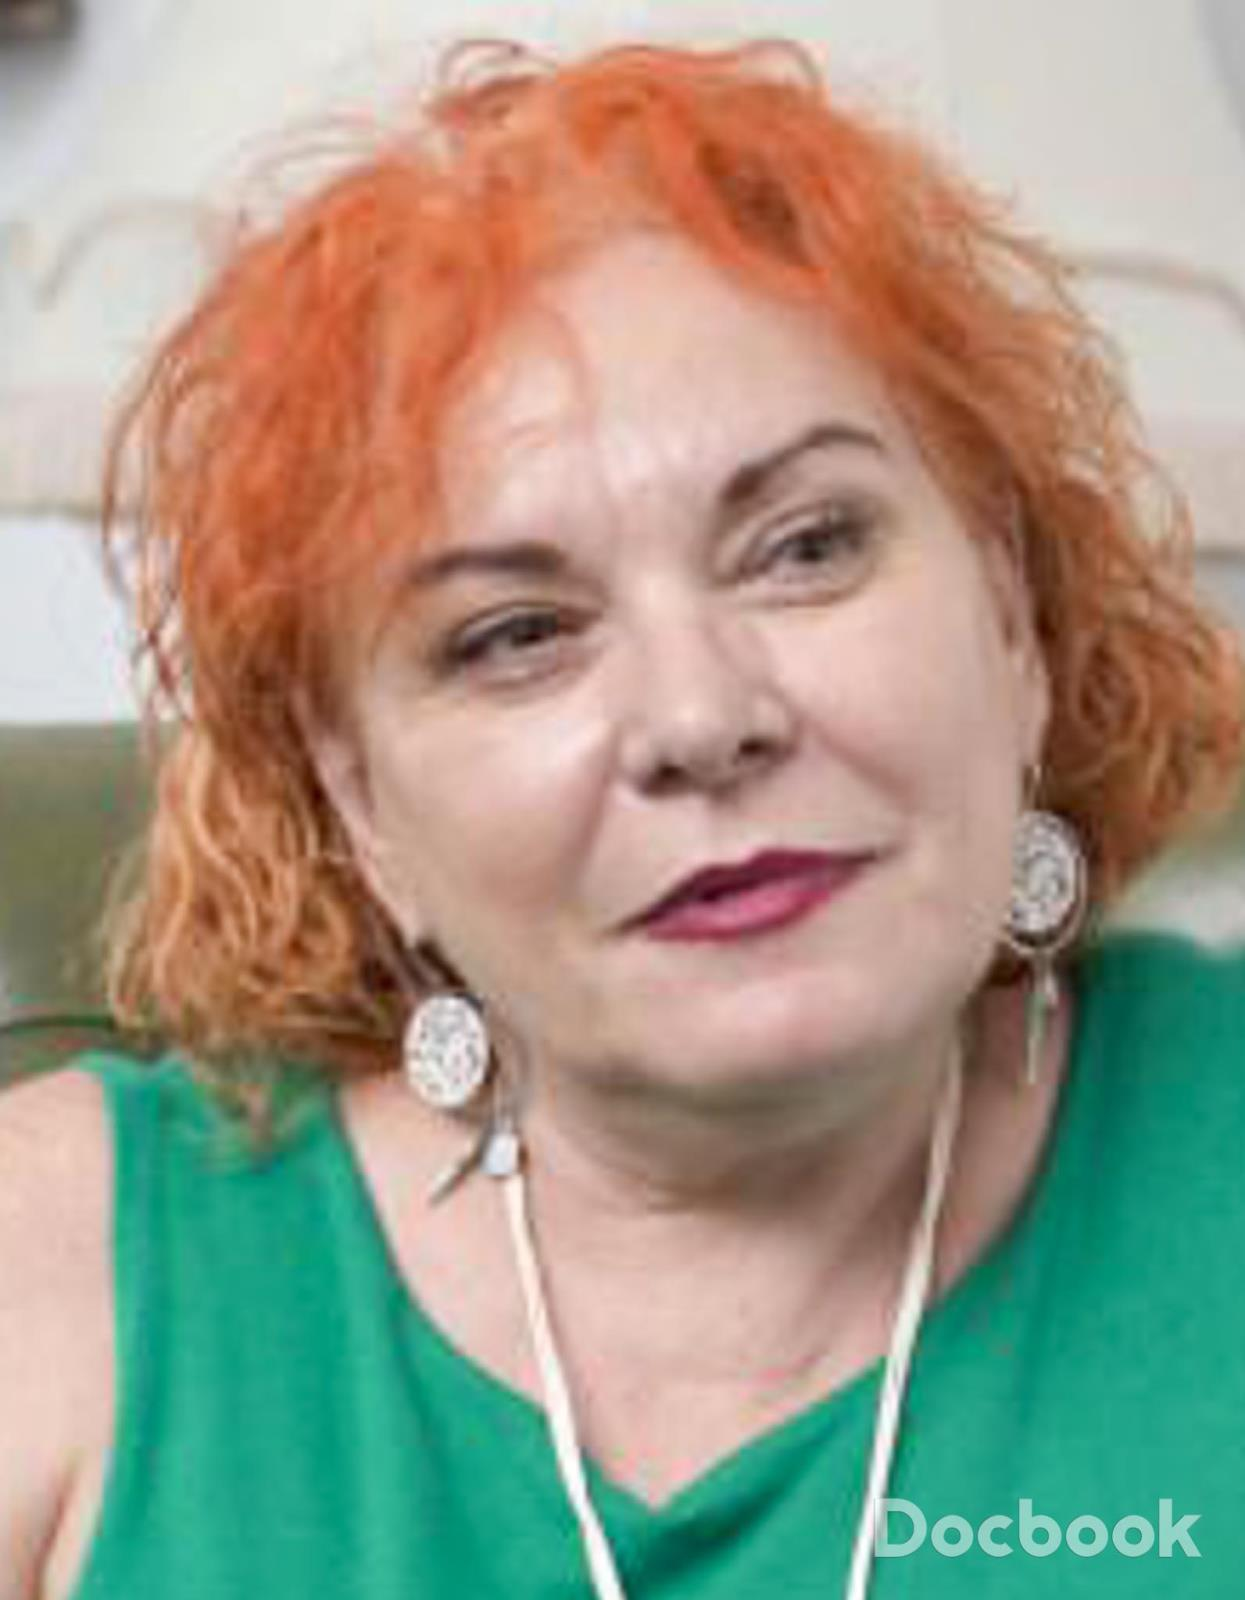 Dr. Ana - Roxana Mischianu